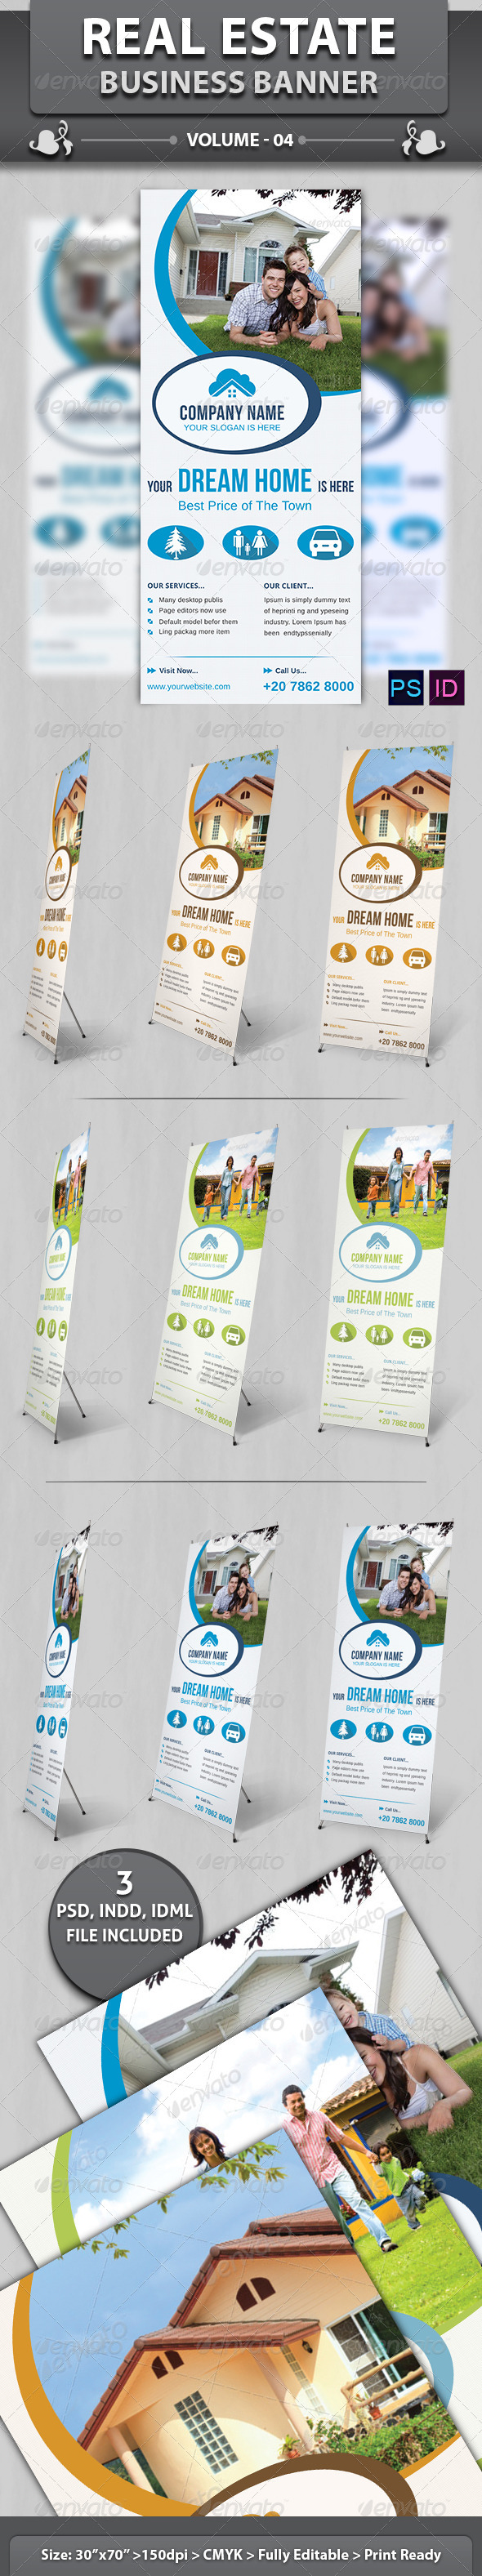 Real Estate Business Banner | Volume 4 - Signage Print Templates